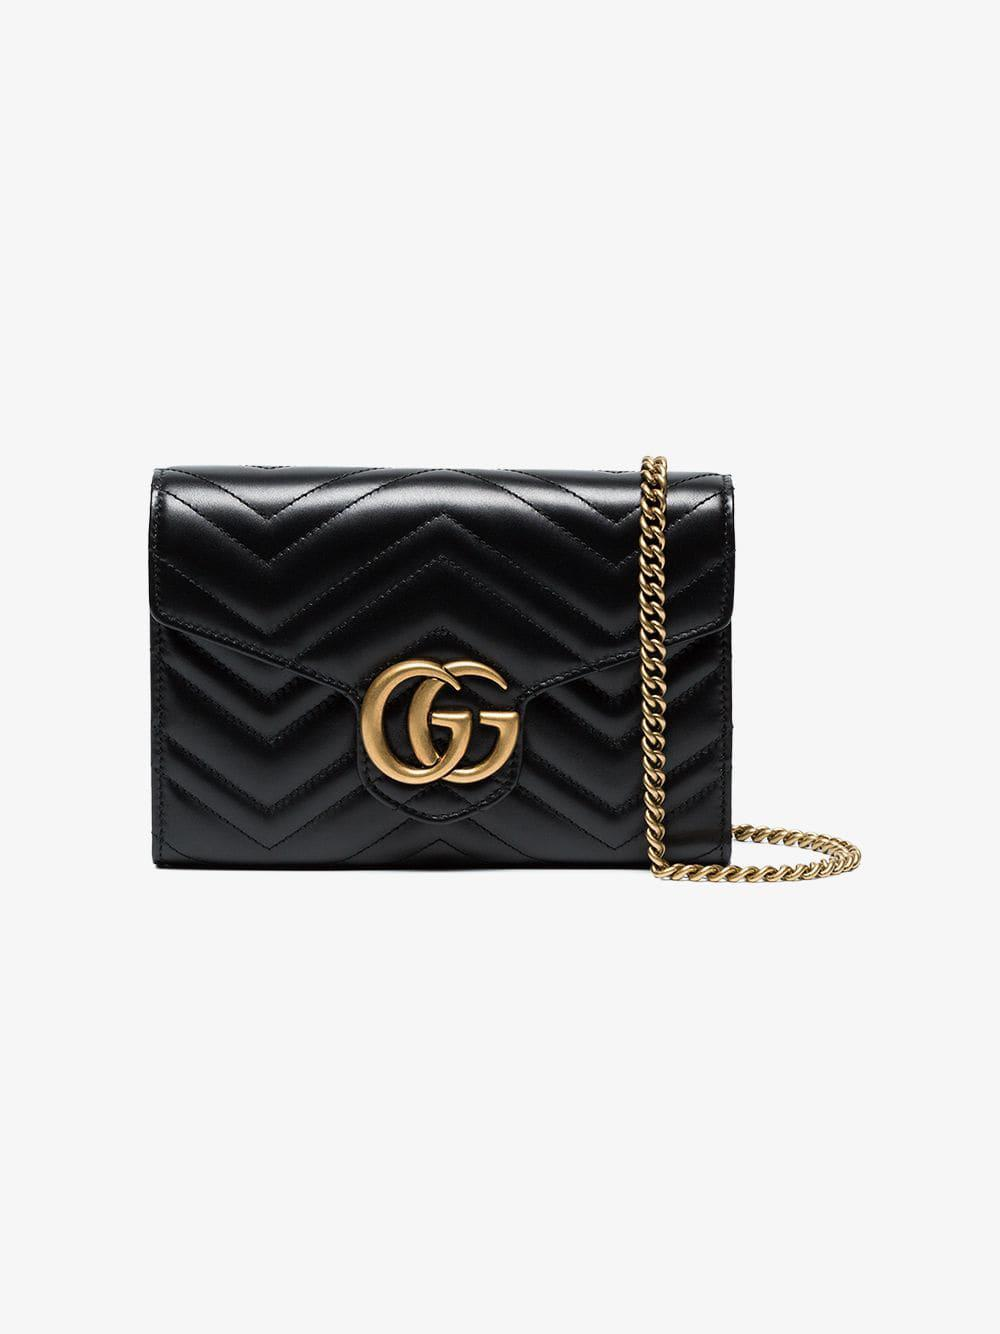 d0cd02873100 Gucci Black GG Marmont Matelassé Mini Bag in Black - Save 8% - Lyst